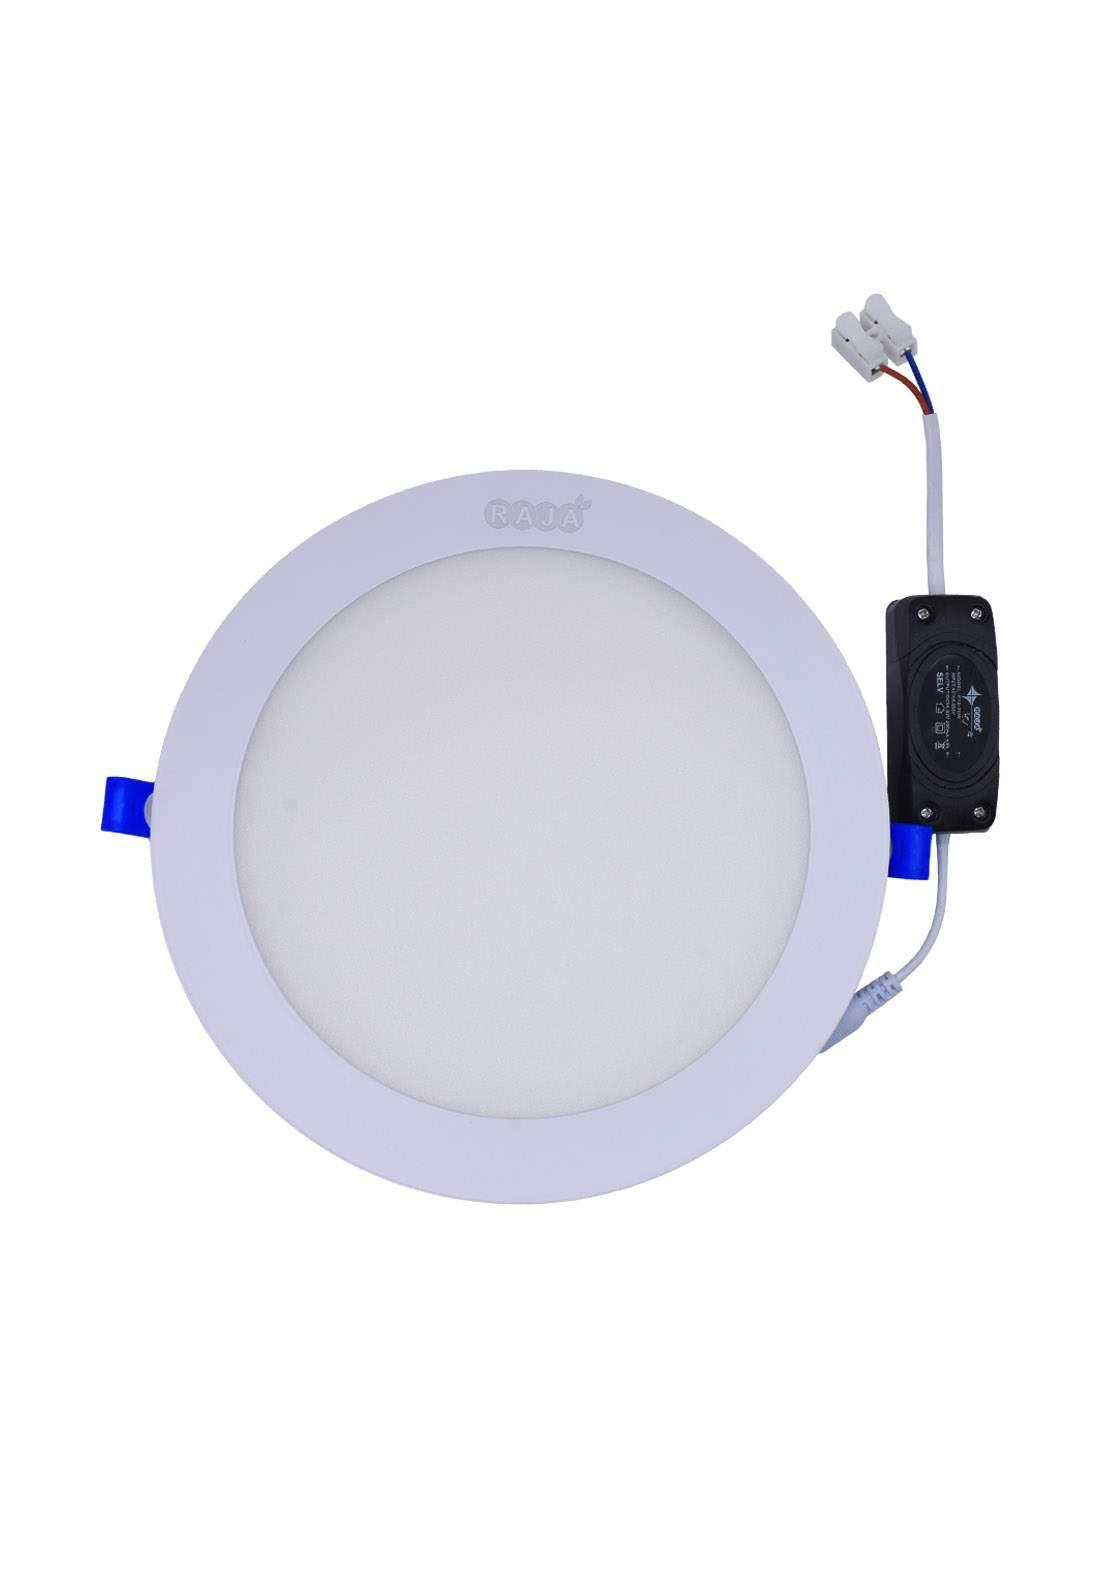 Raja LED Down Light Surface Fast Install 18=20 W ضوء ليد دائري ظاهري